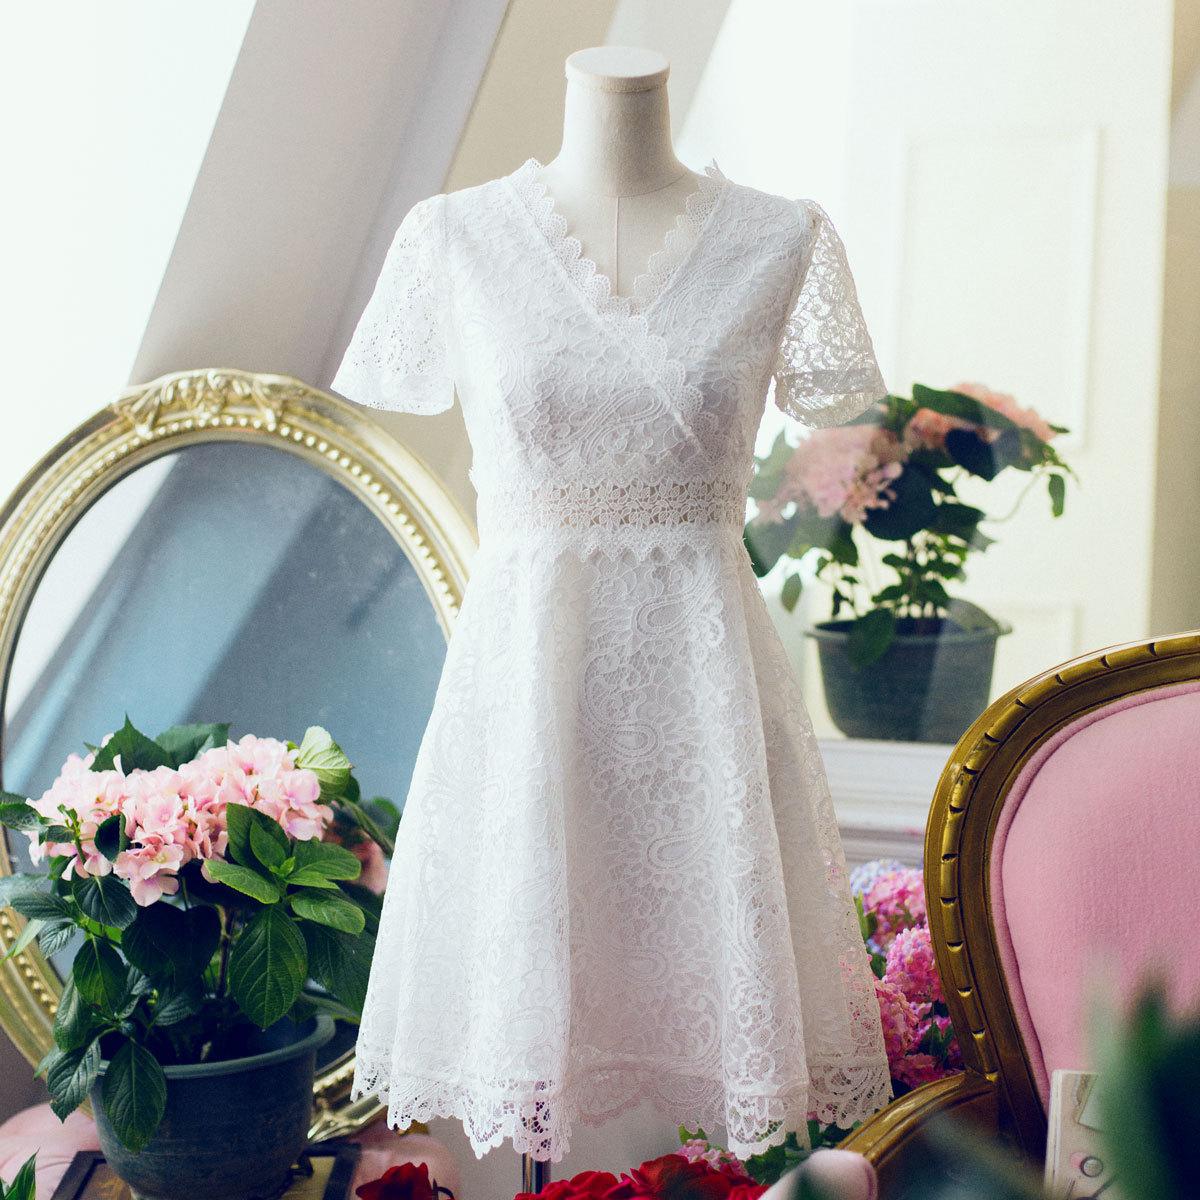 BGS女装2018年夏装新甜美波浪形花边V领镂空修身短袖蕾丝连衣裙仙